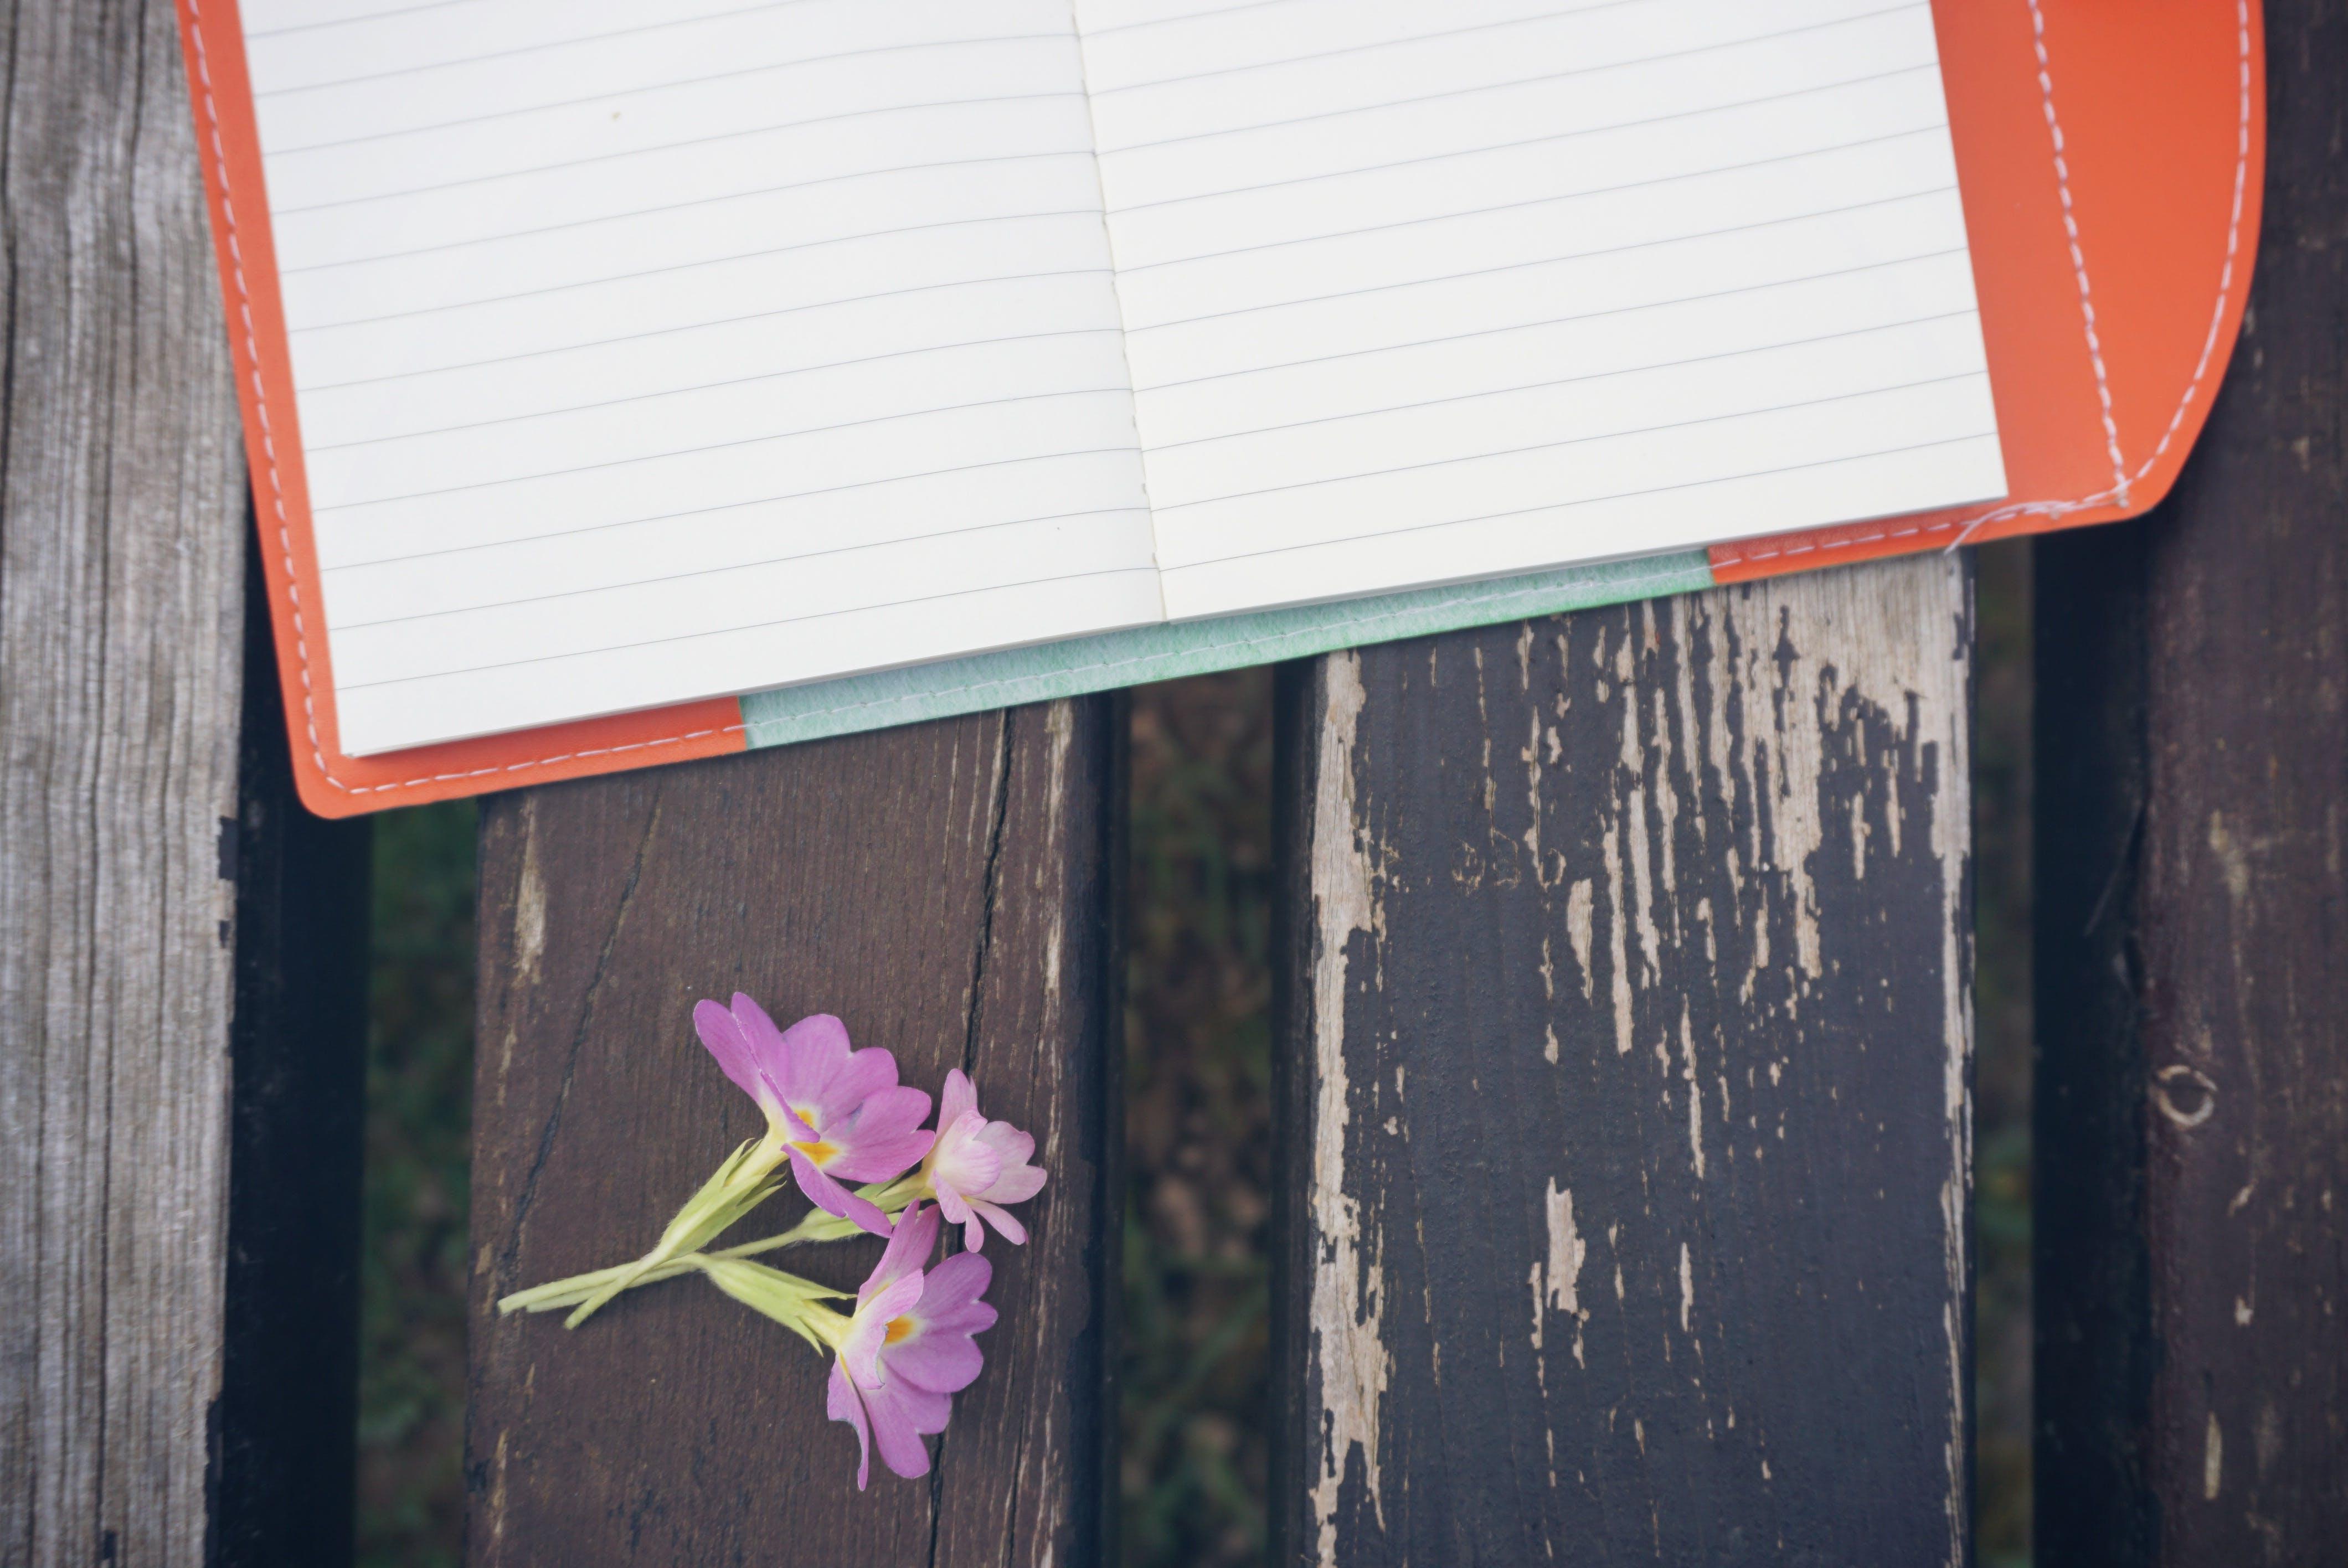 Purple Petaled Flower Beside White Line Paper on Black Wooden Desk